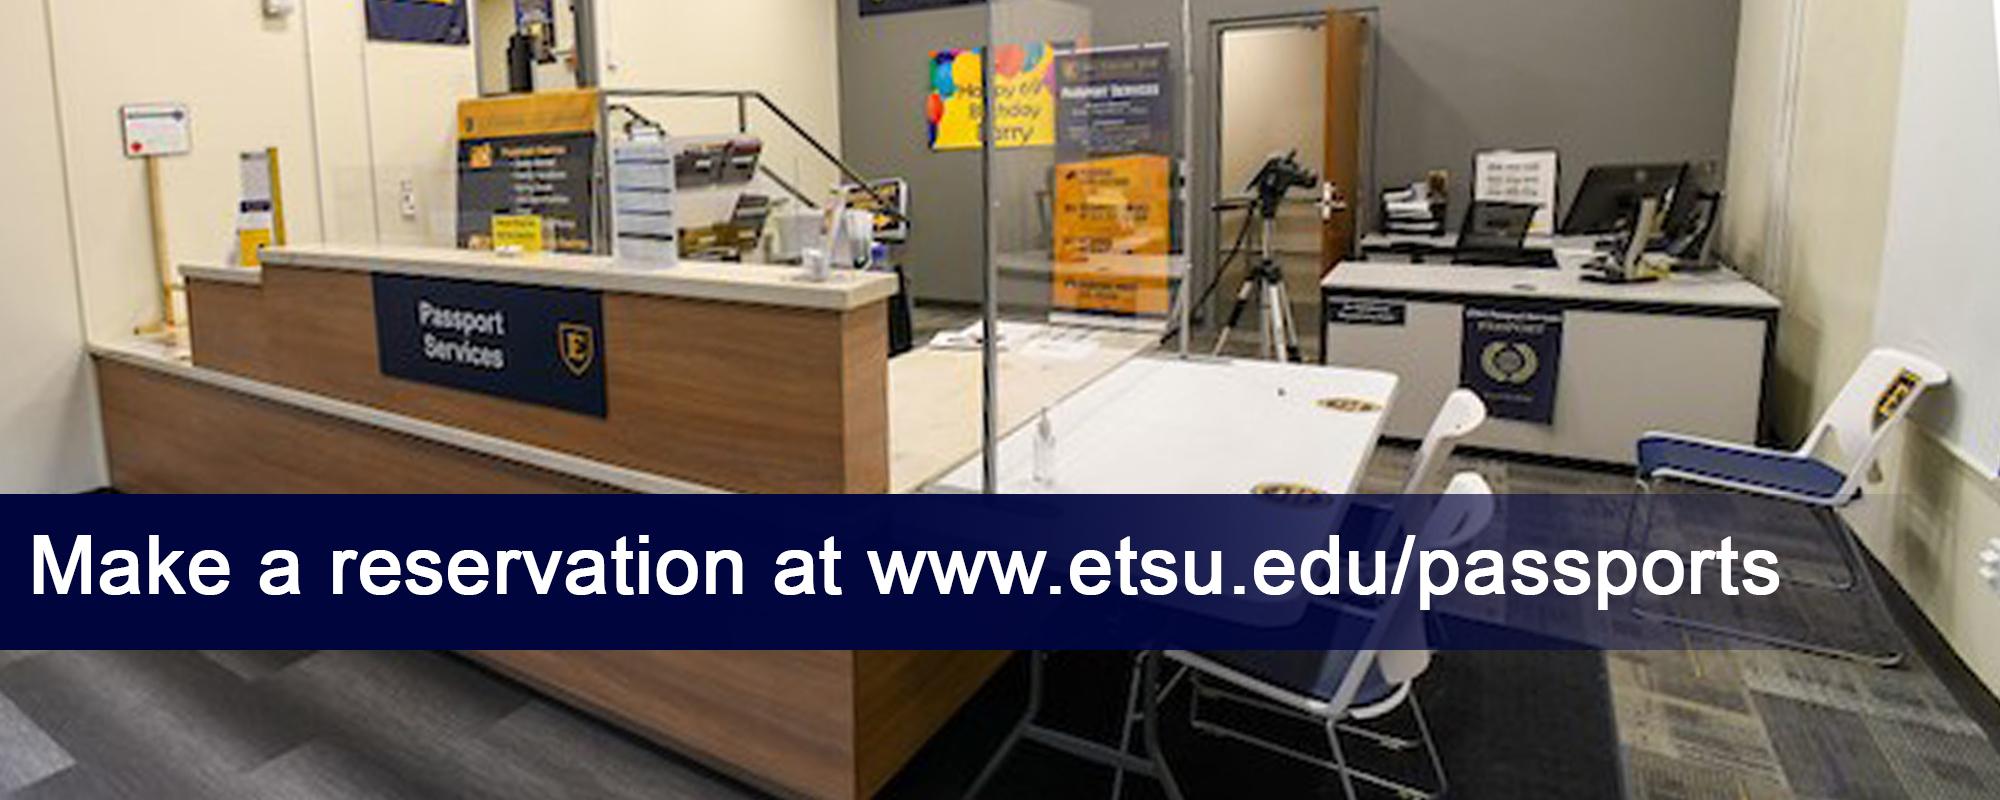 Make a reservation at www.etsu.edu/passport